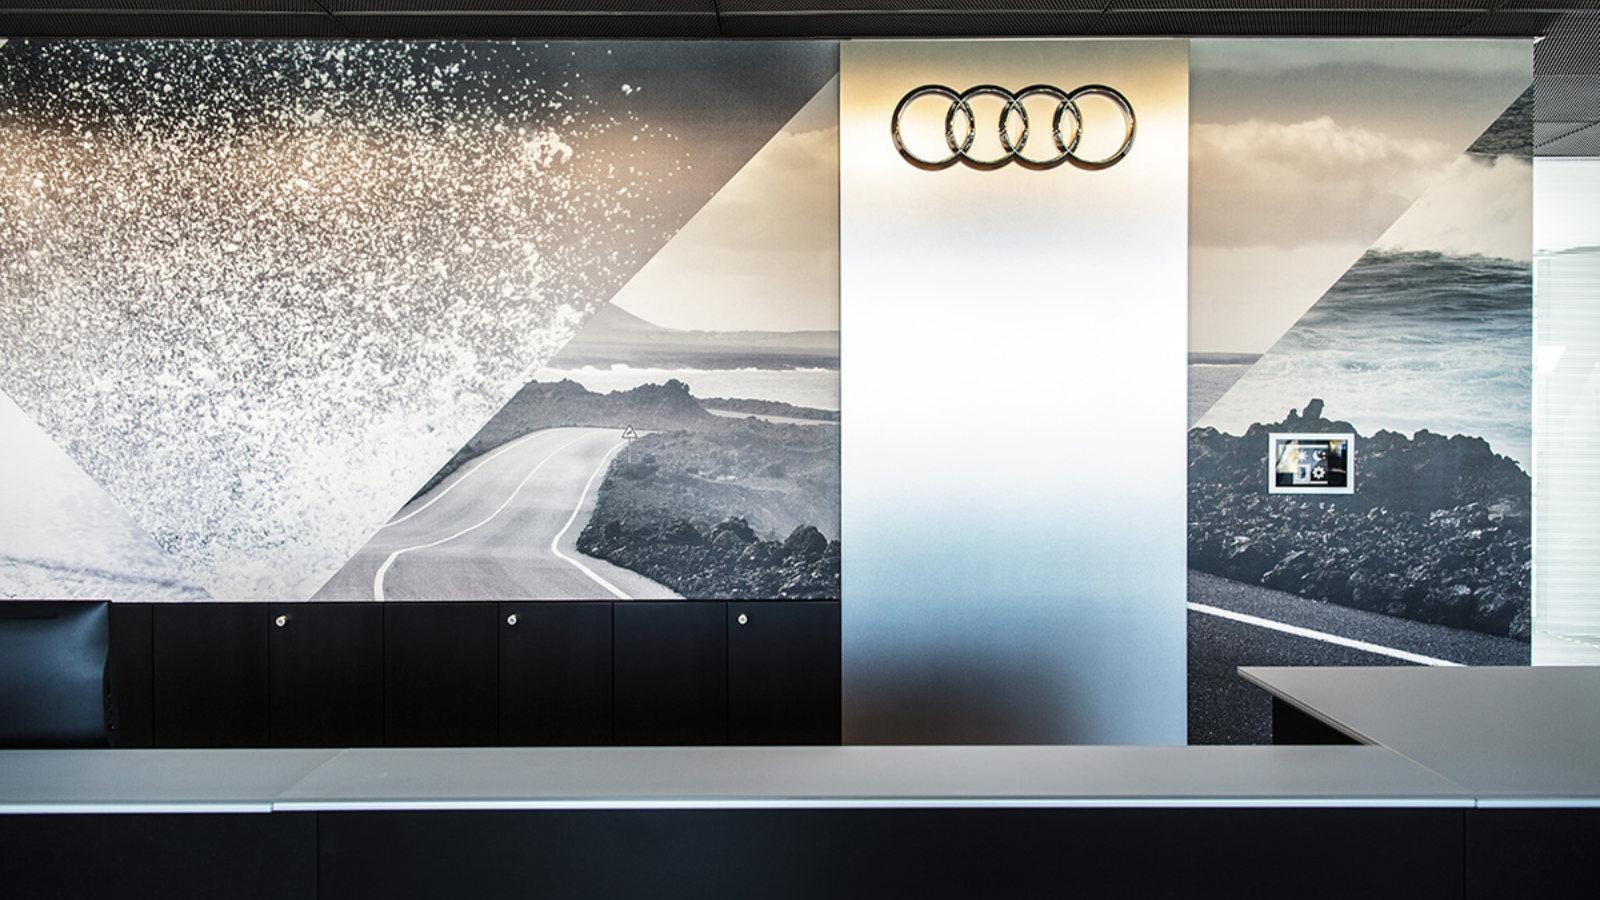 Dekorujemy Salon Audi Cz. 1